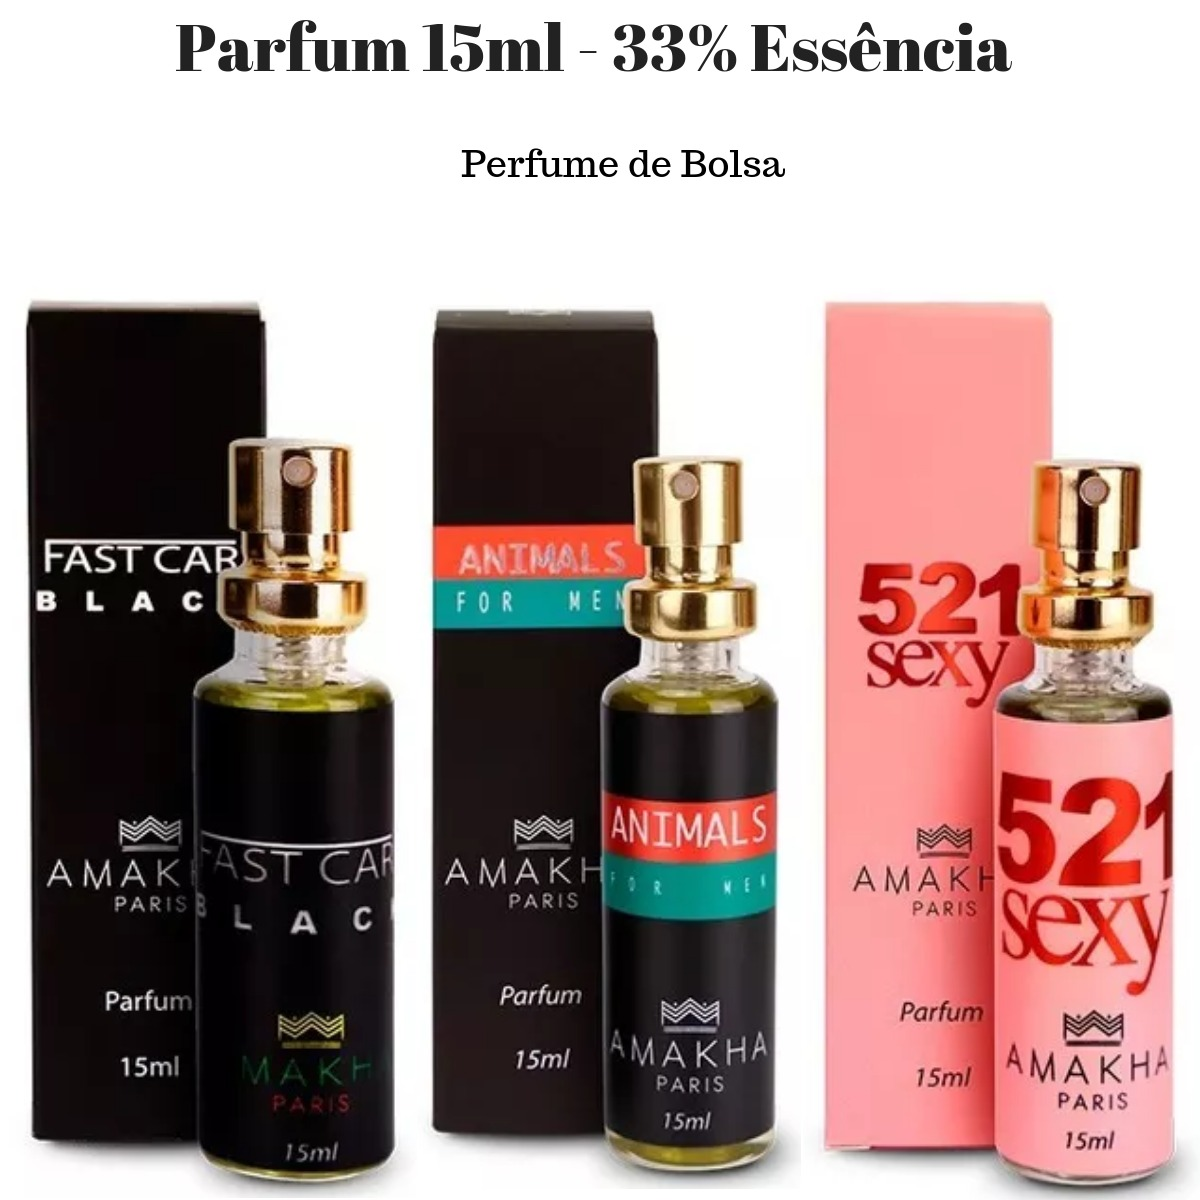 2df5070cf Perfume Amakha Paris 15ml - Kit 5 Unidades - Frete Grátis - R  139 ...